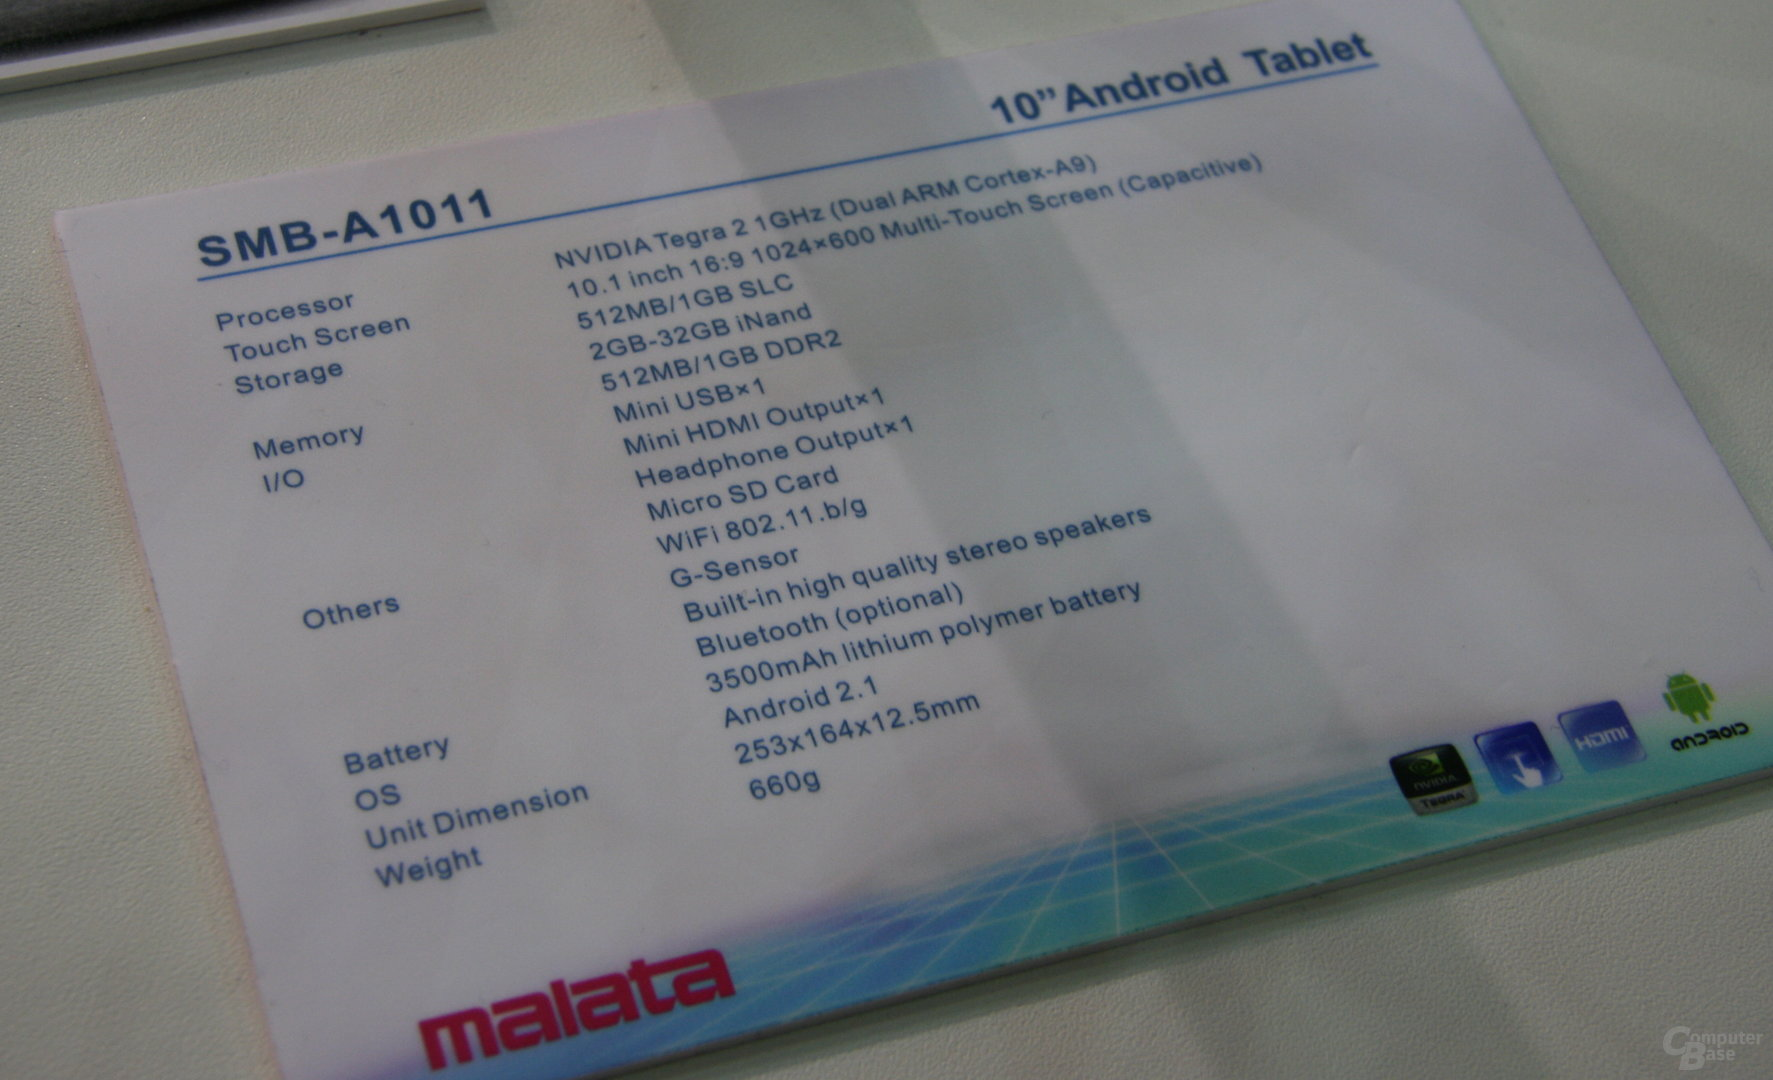 Malata Tablet